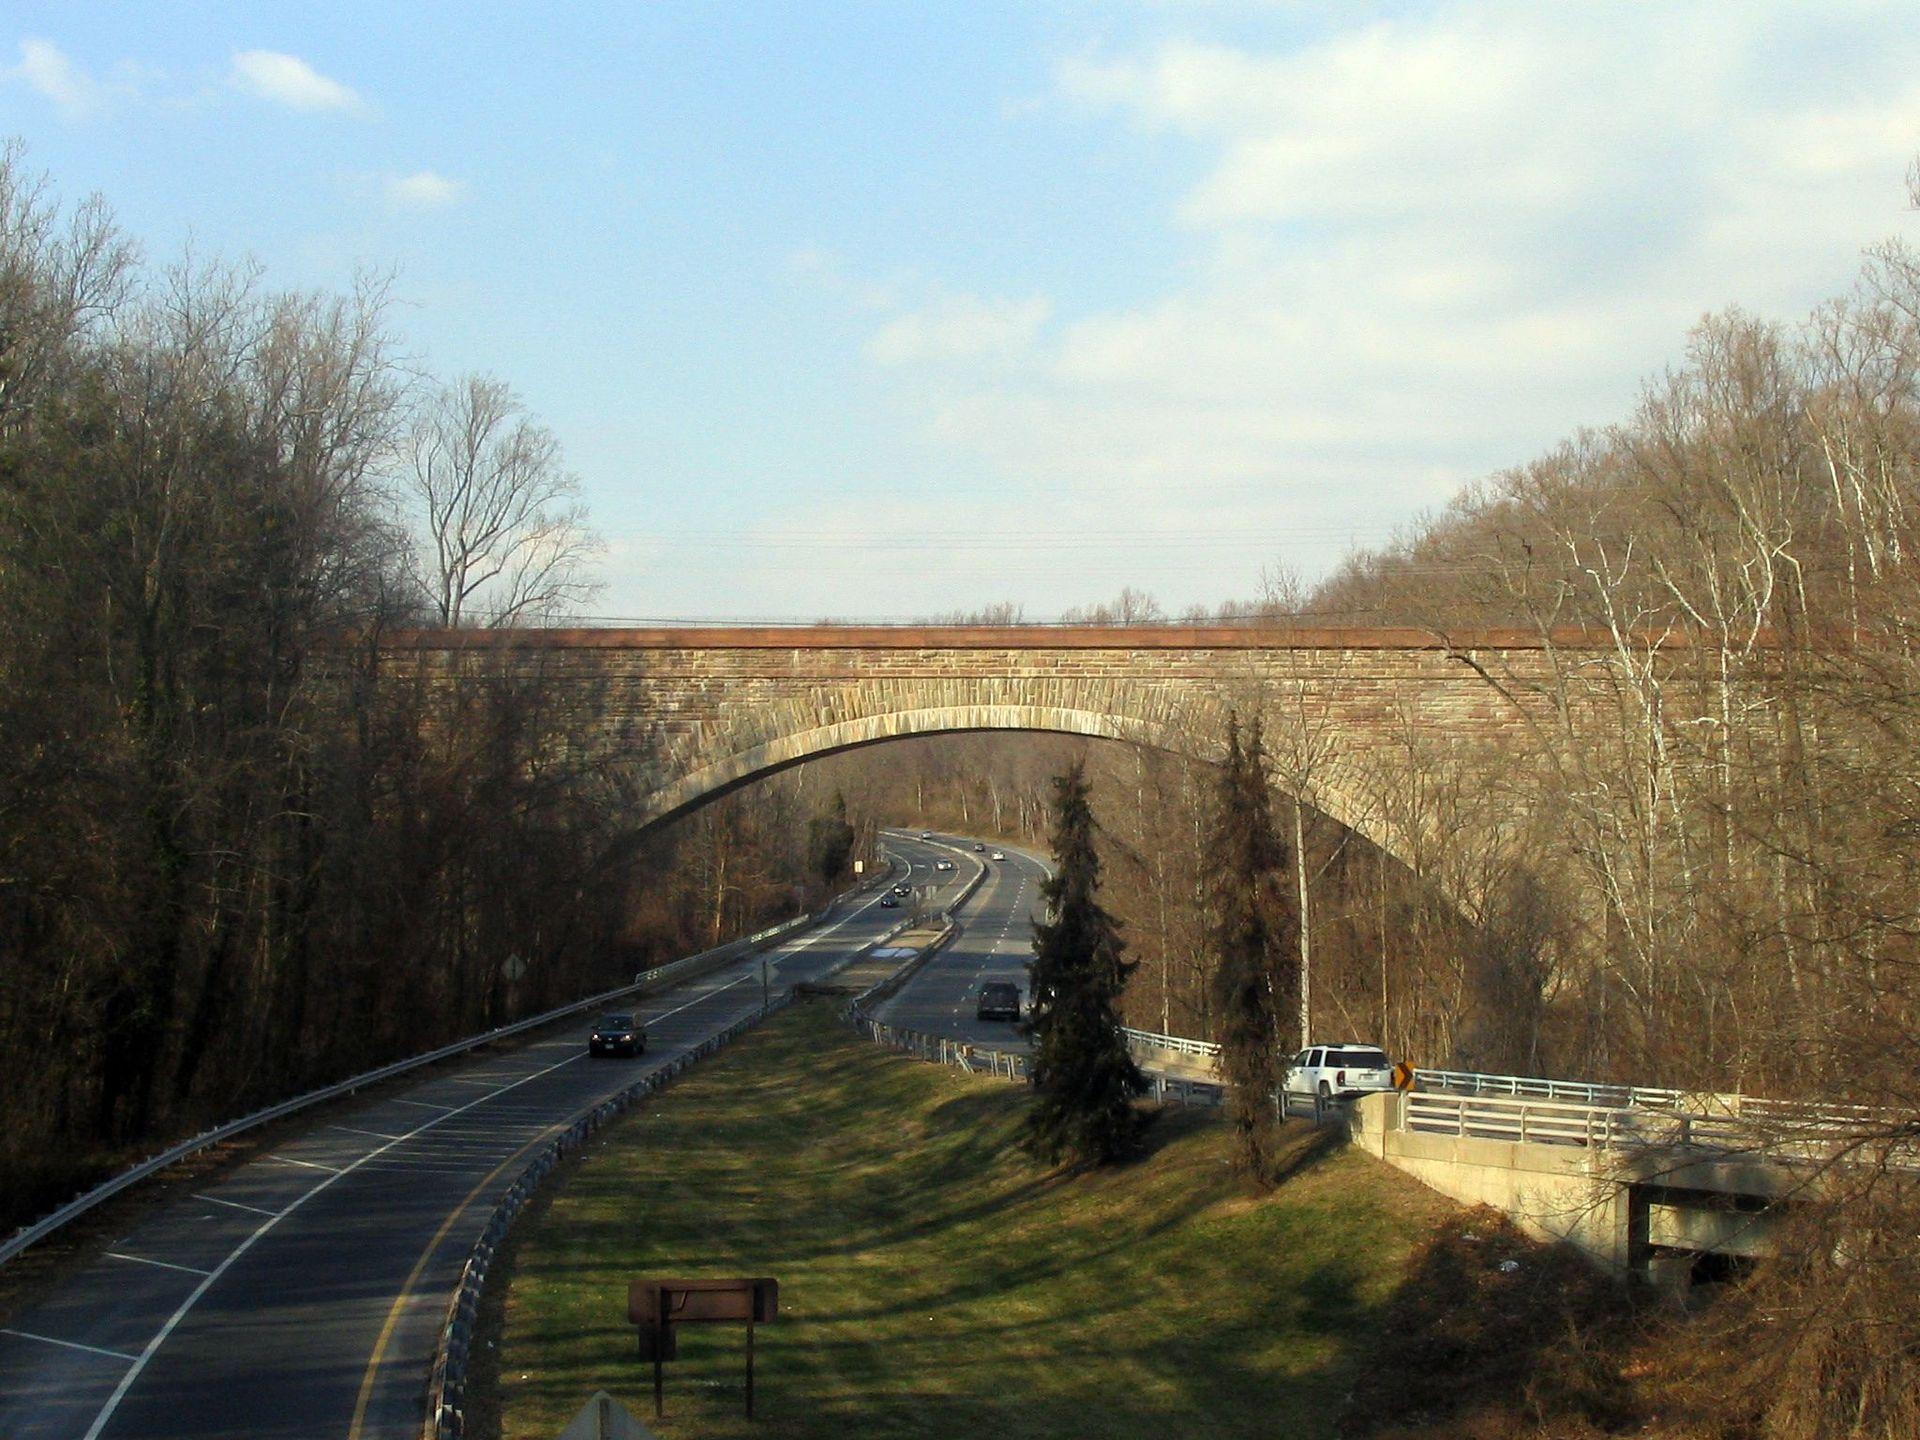 The union arch bridge carries the Washington Aqueduct across Cabin John Creek